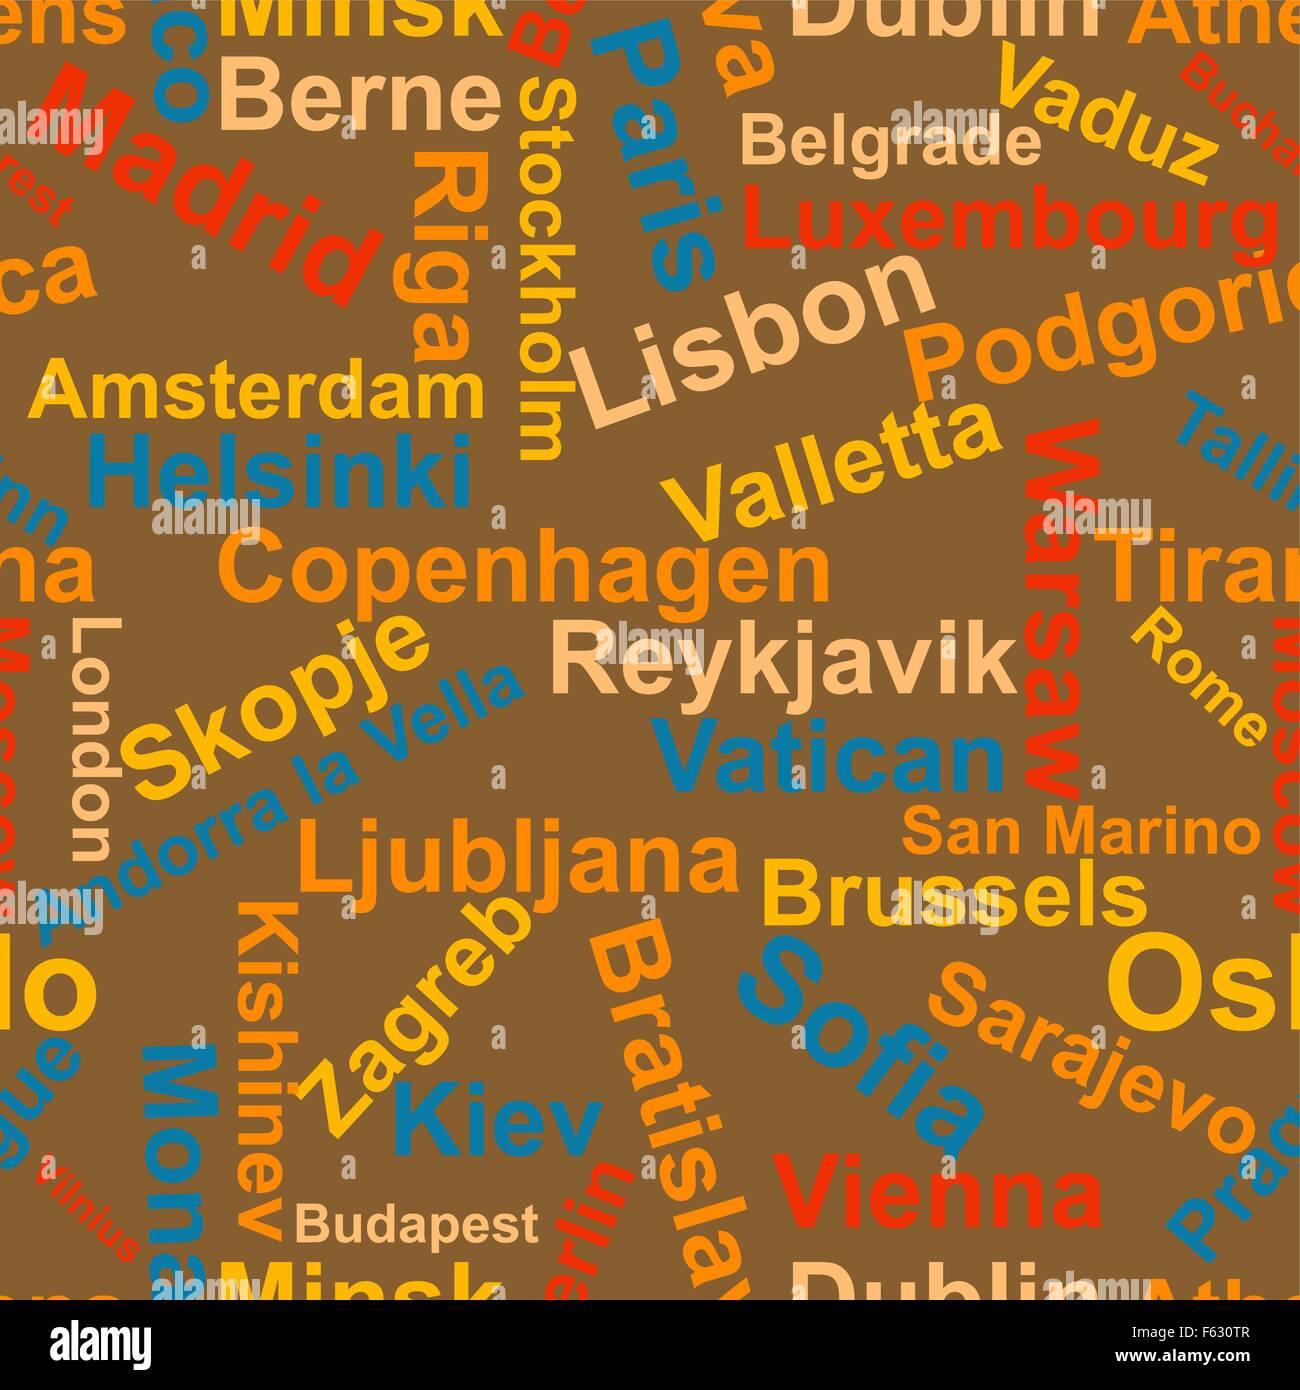 Origines des noms des capitales d'Europe.Vector Photo Stock